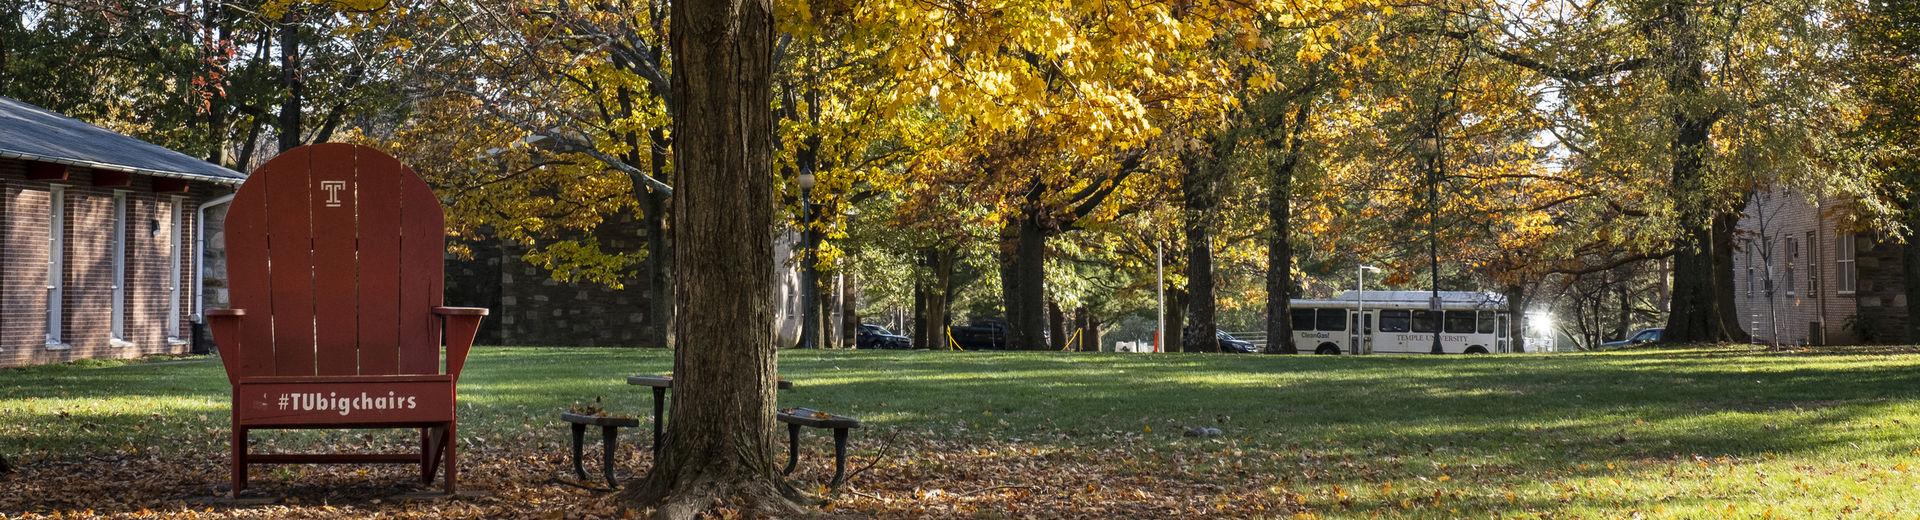 Big chair under a tree